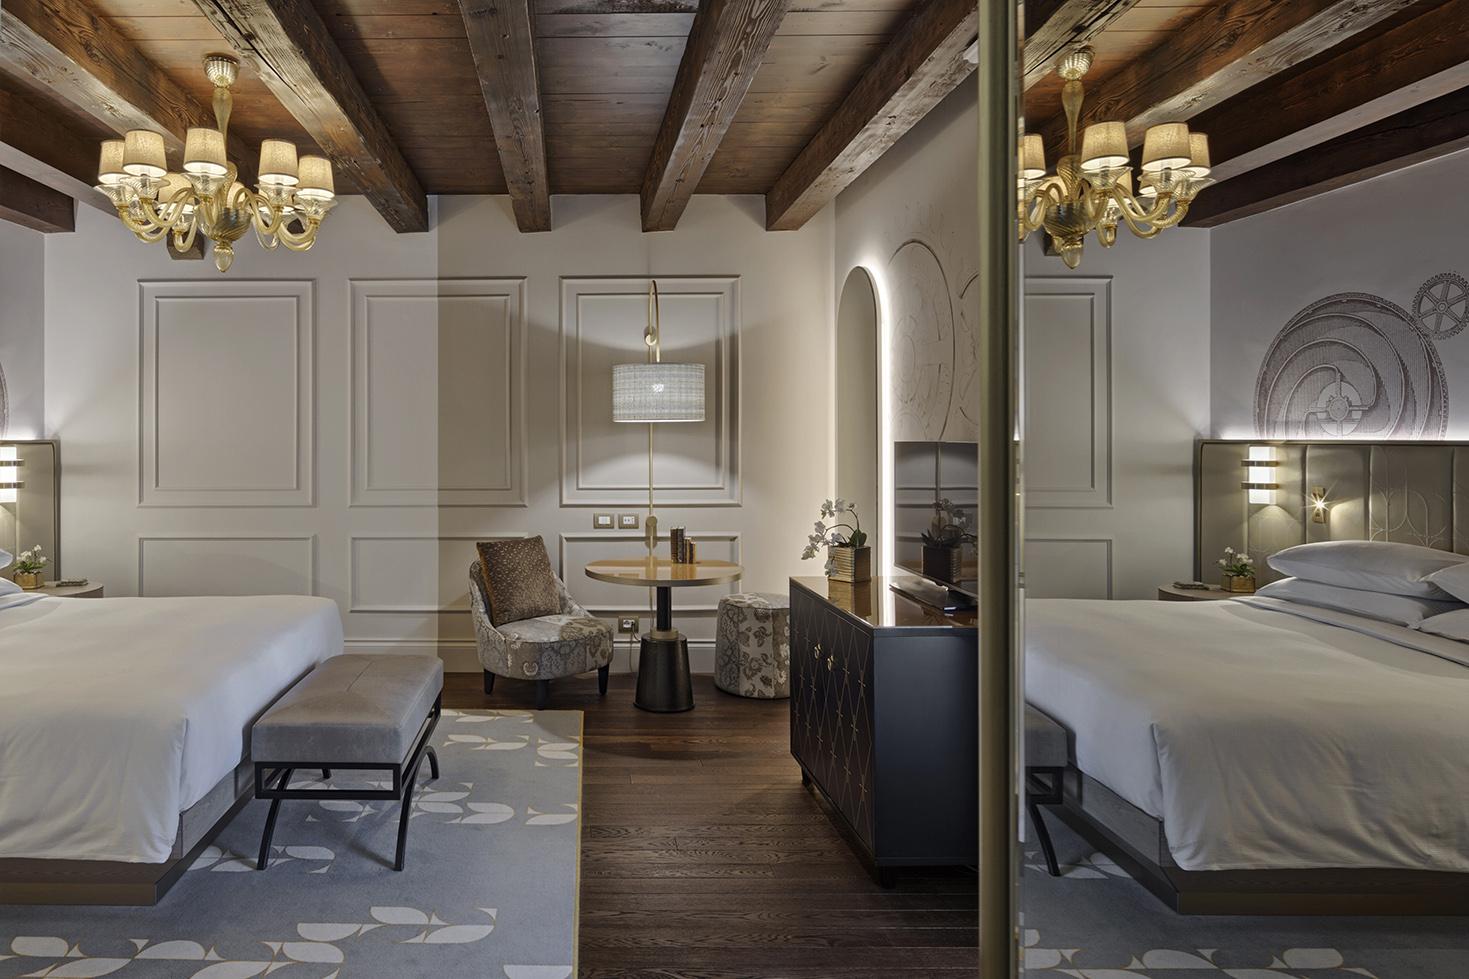 Hotel Hilton Molino Stucky, room Andrea Sarti  CAST1466